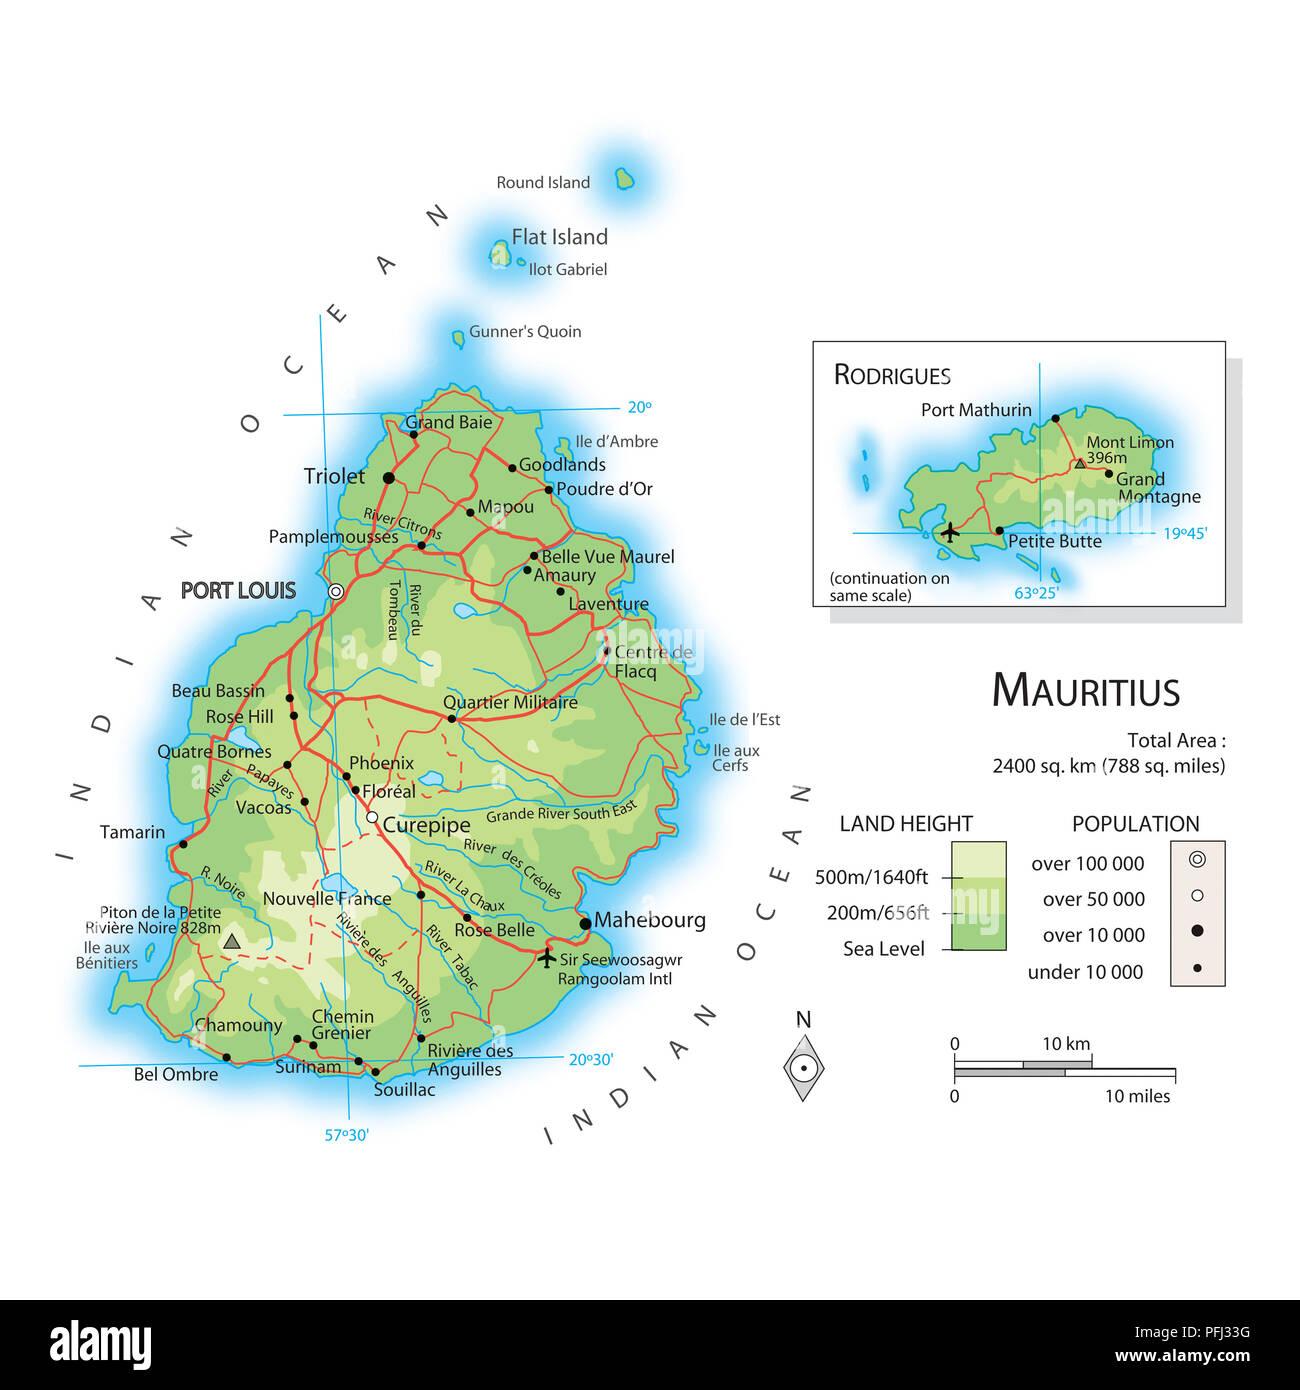 Map Of Mauritius Stock Photo 216141844 Alamy